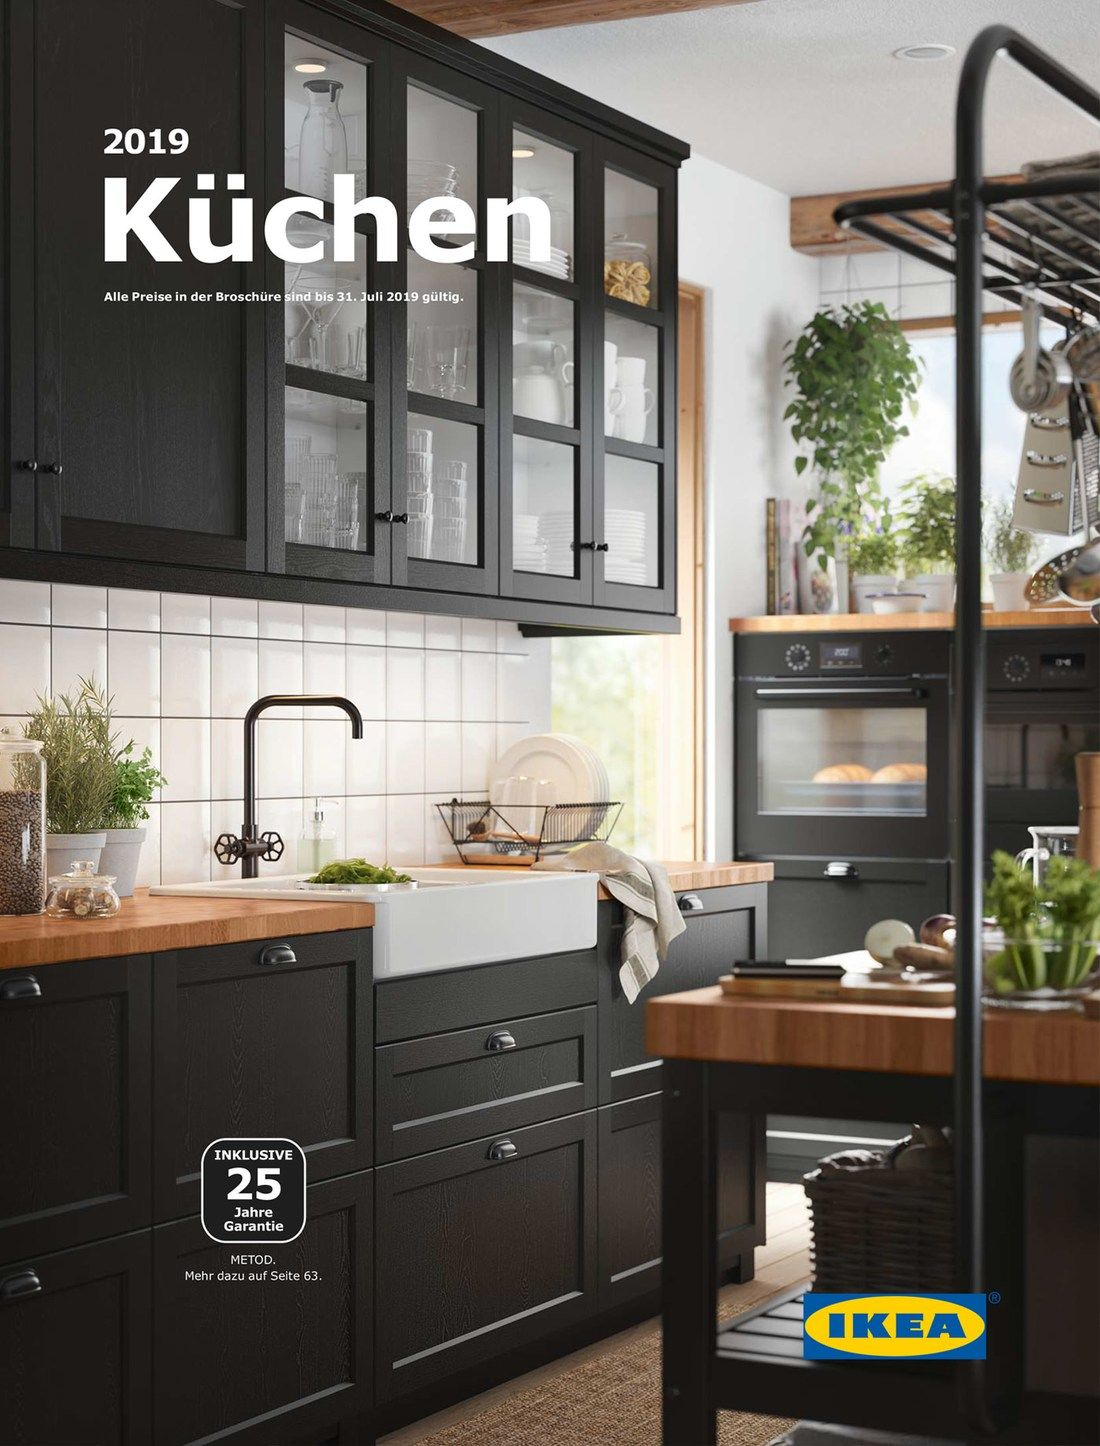 Katalog Fur 2020 In 2020 Kuchen Ideen Ikea Kuchendesign